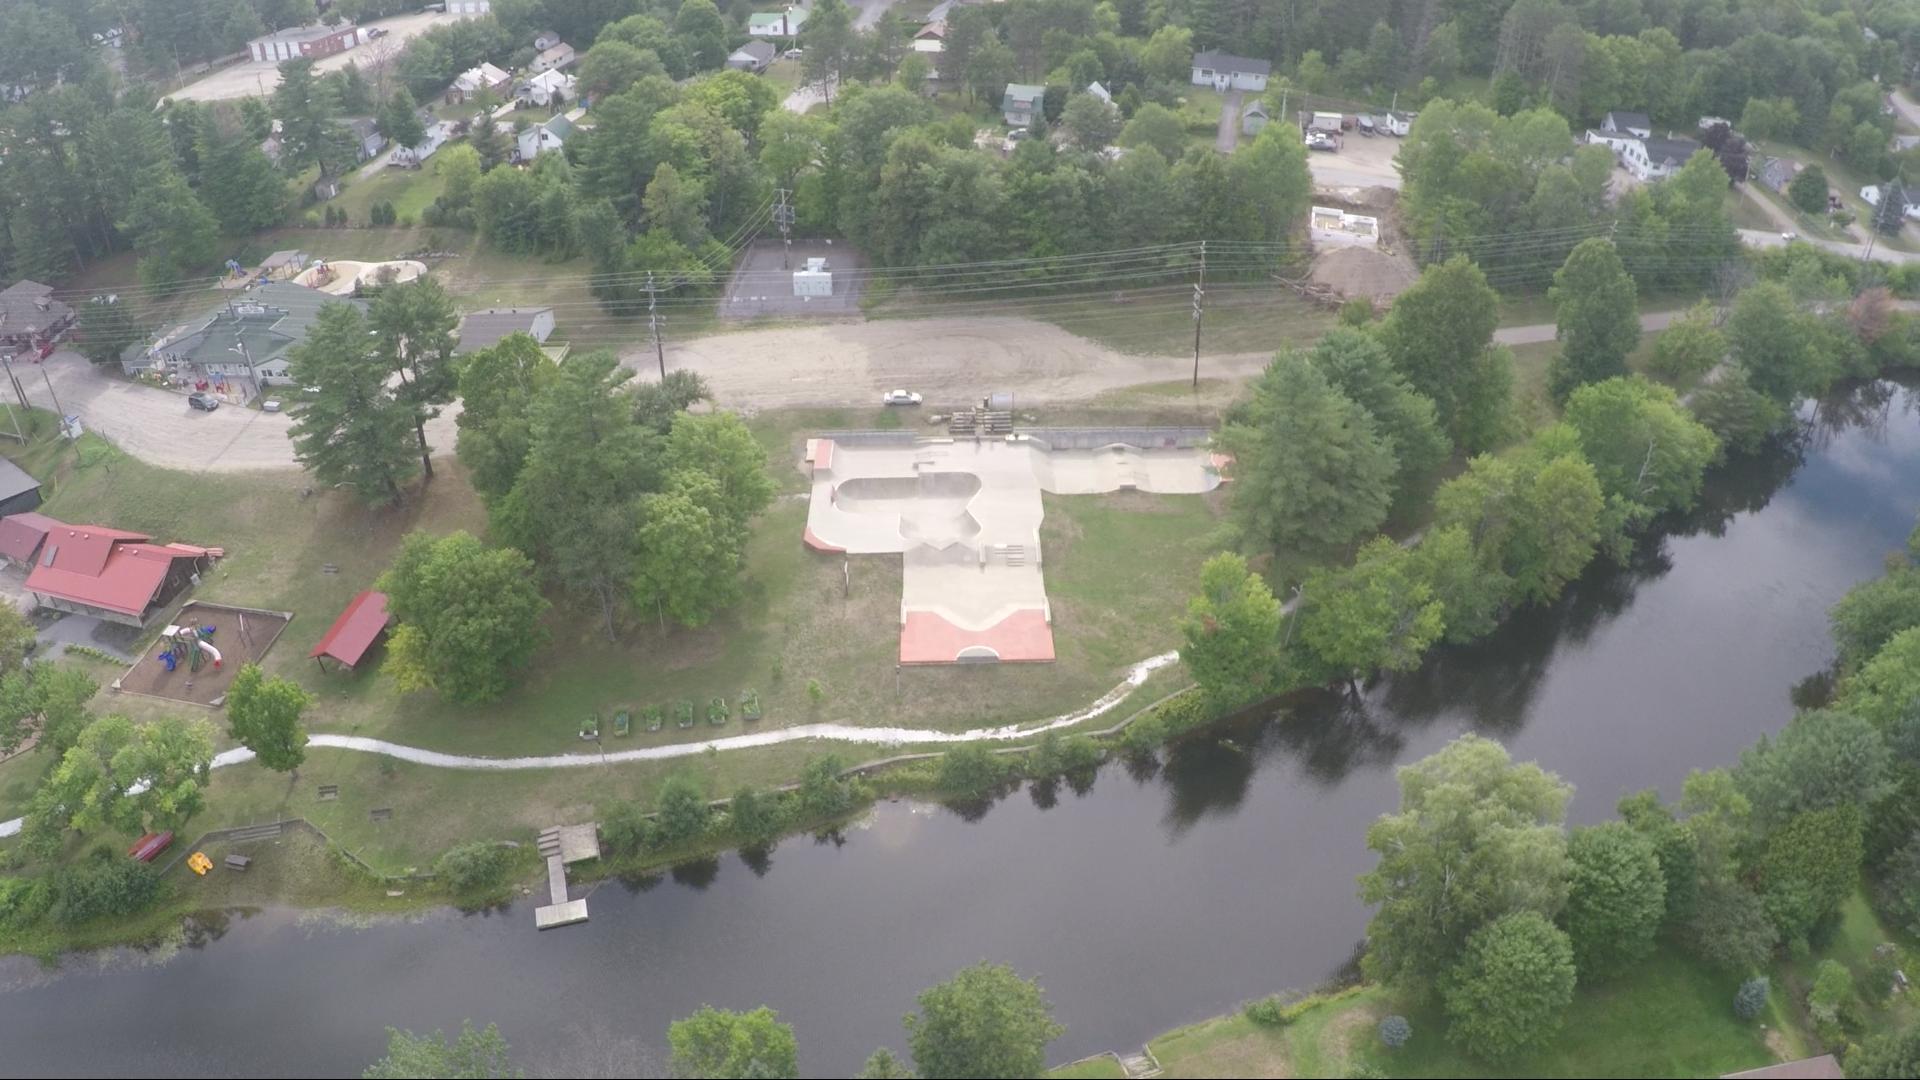 The Freedom Skate Park in Bancroft Ontario.